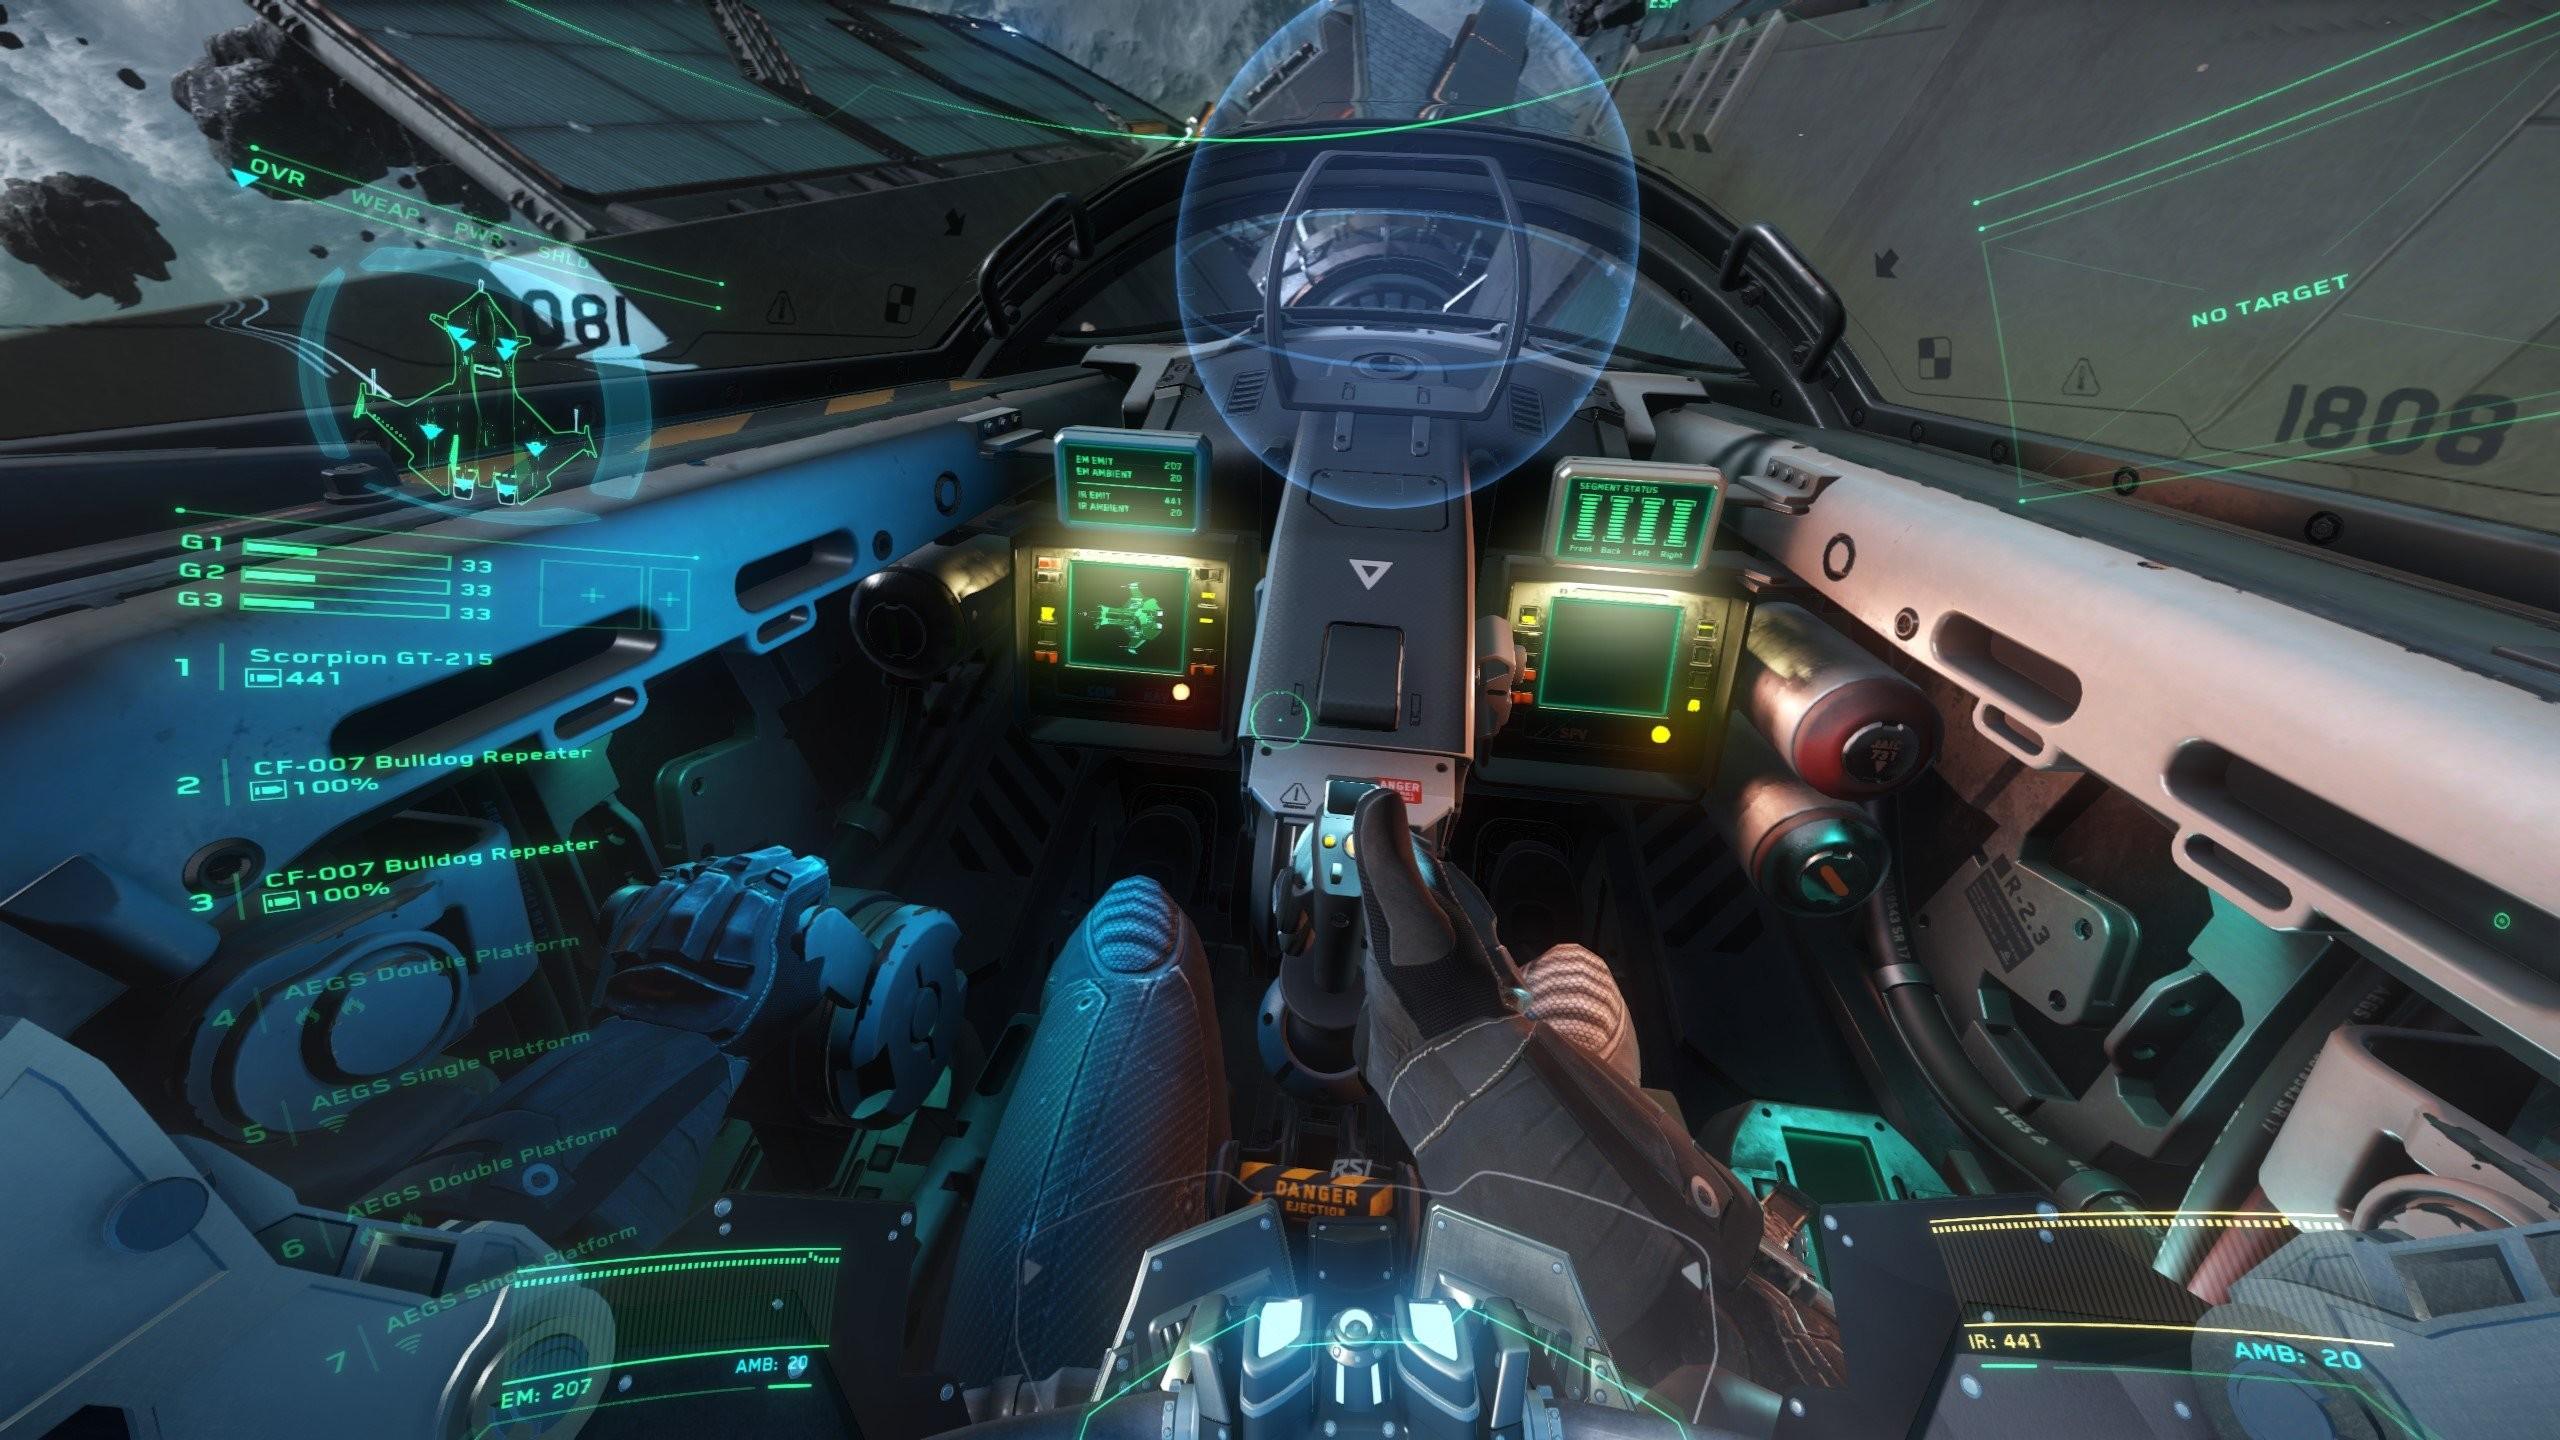 STAR CITIZEN simulator sci-fi spaceship space action fighting fps shooter  futuristic 1citizen startegy tactical wallpaper     683226    WallpaperUP